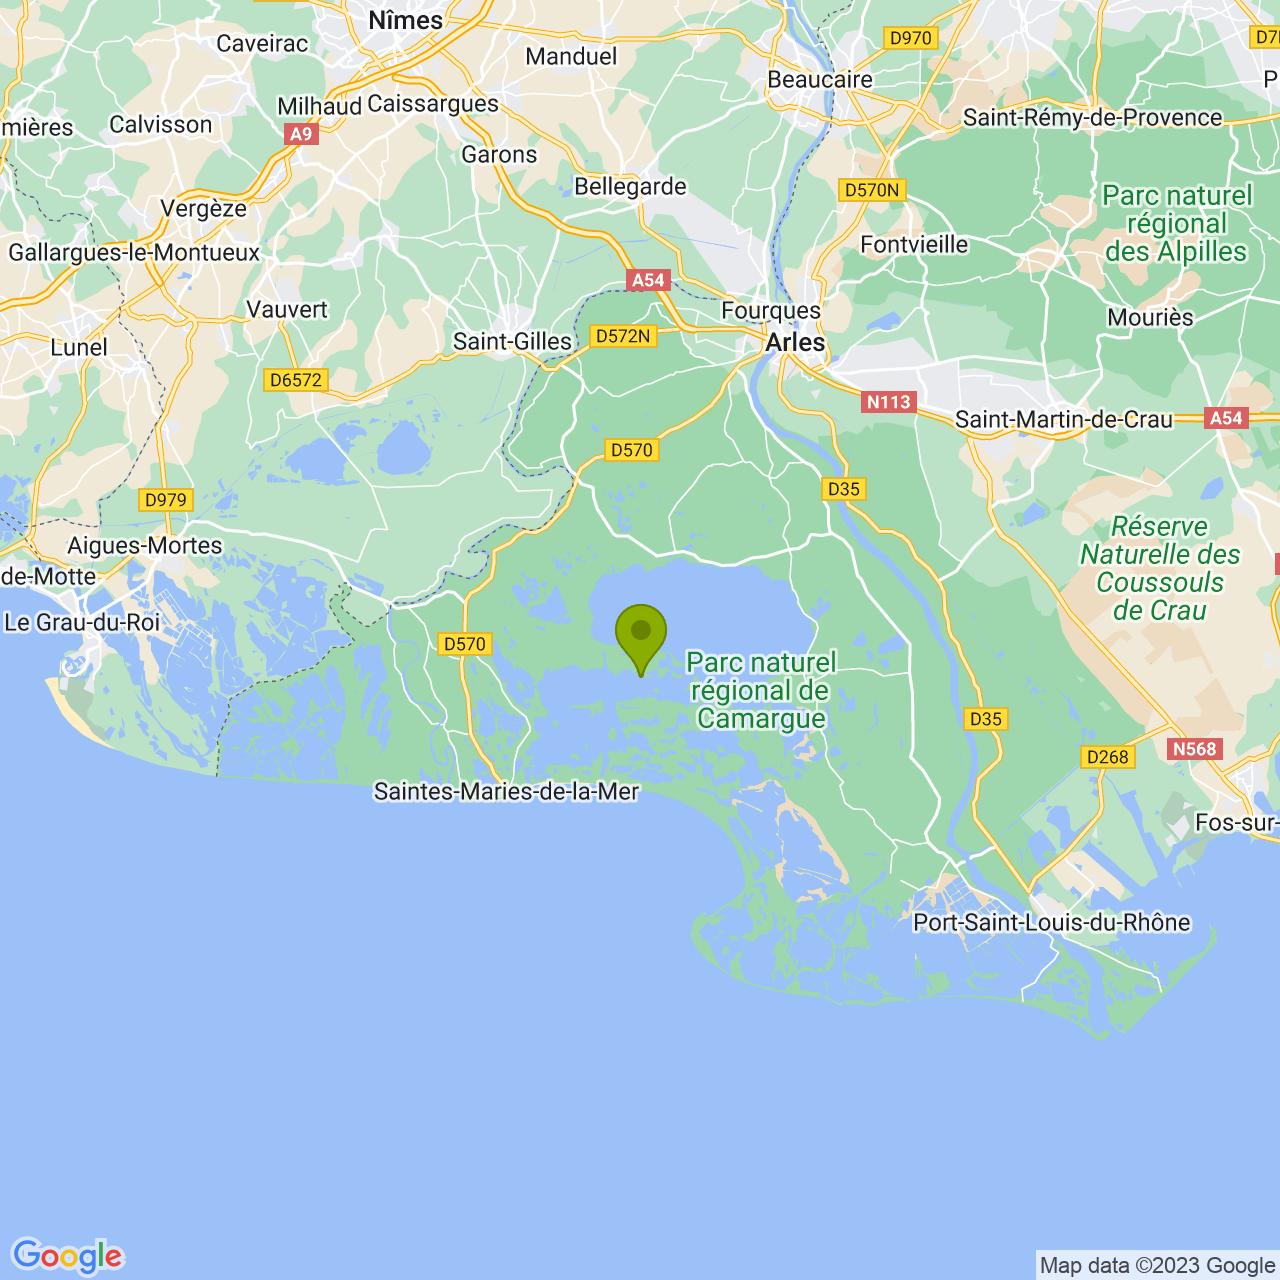 Regionaal Natuurpark De Camargue